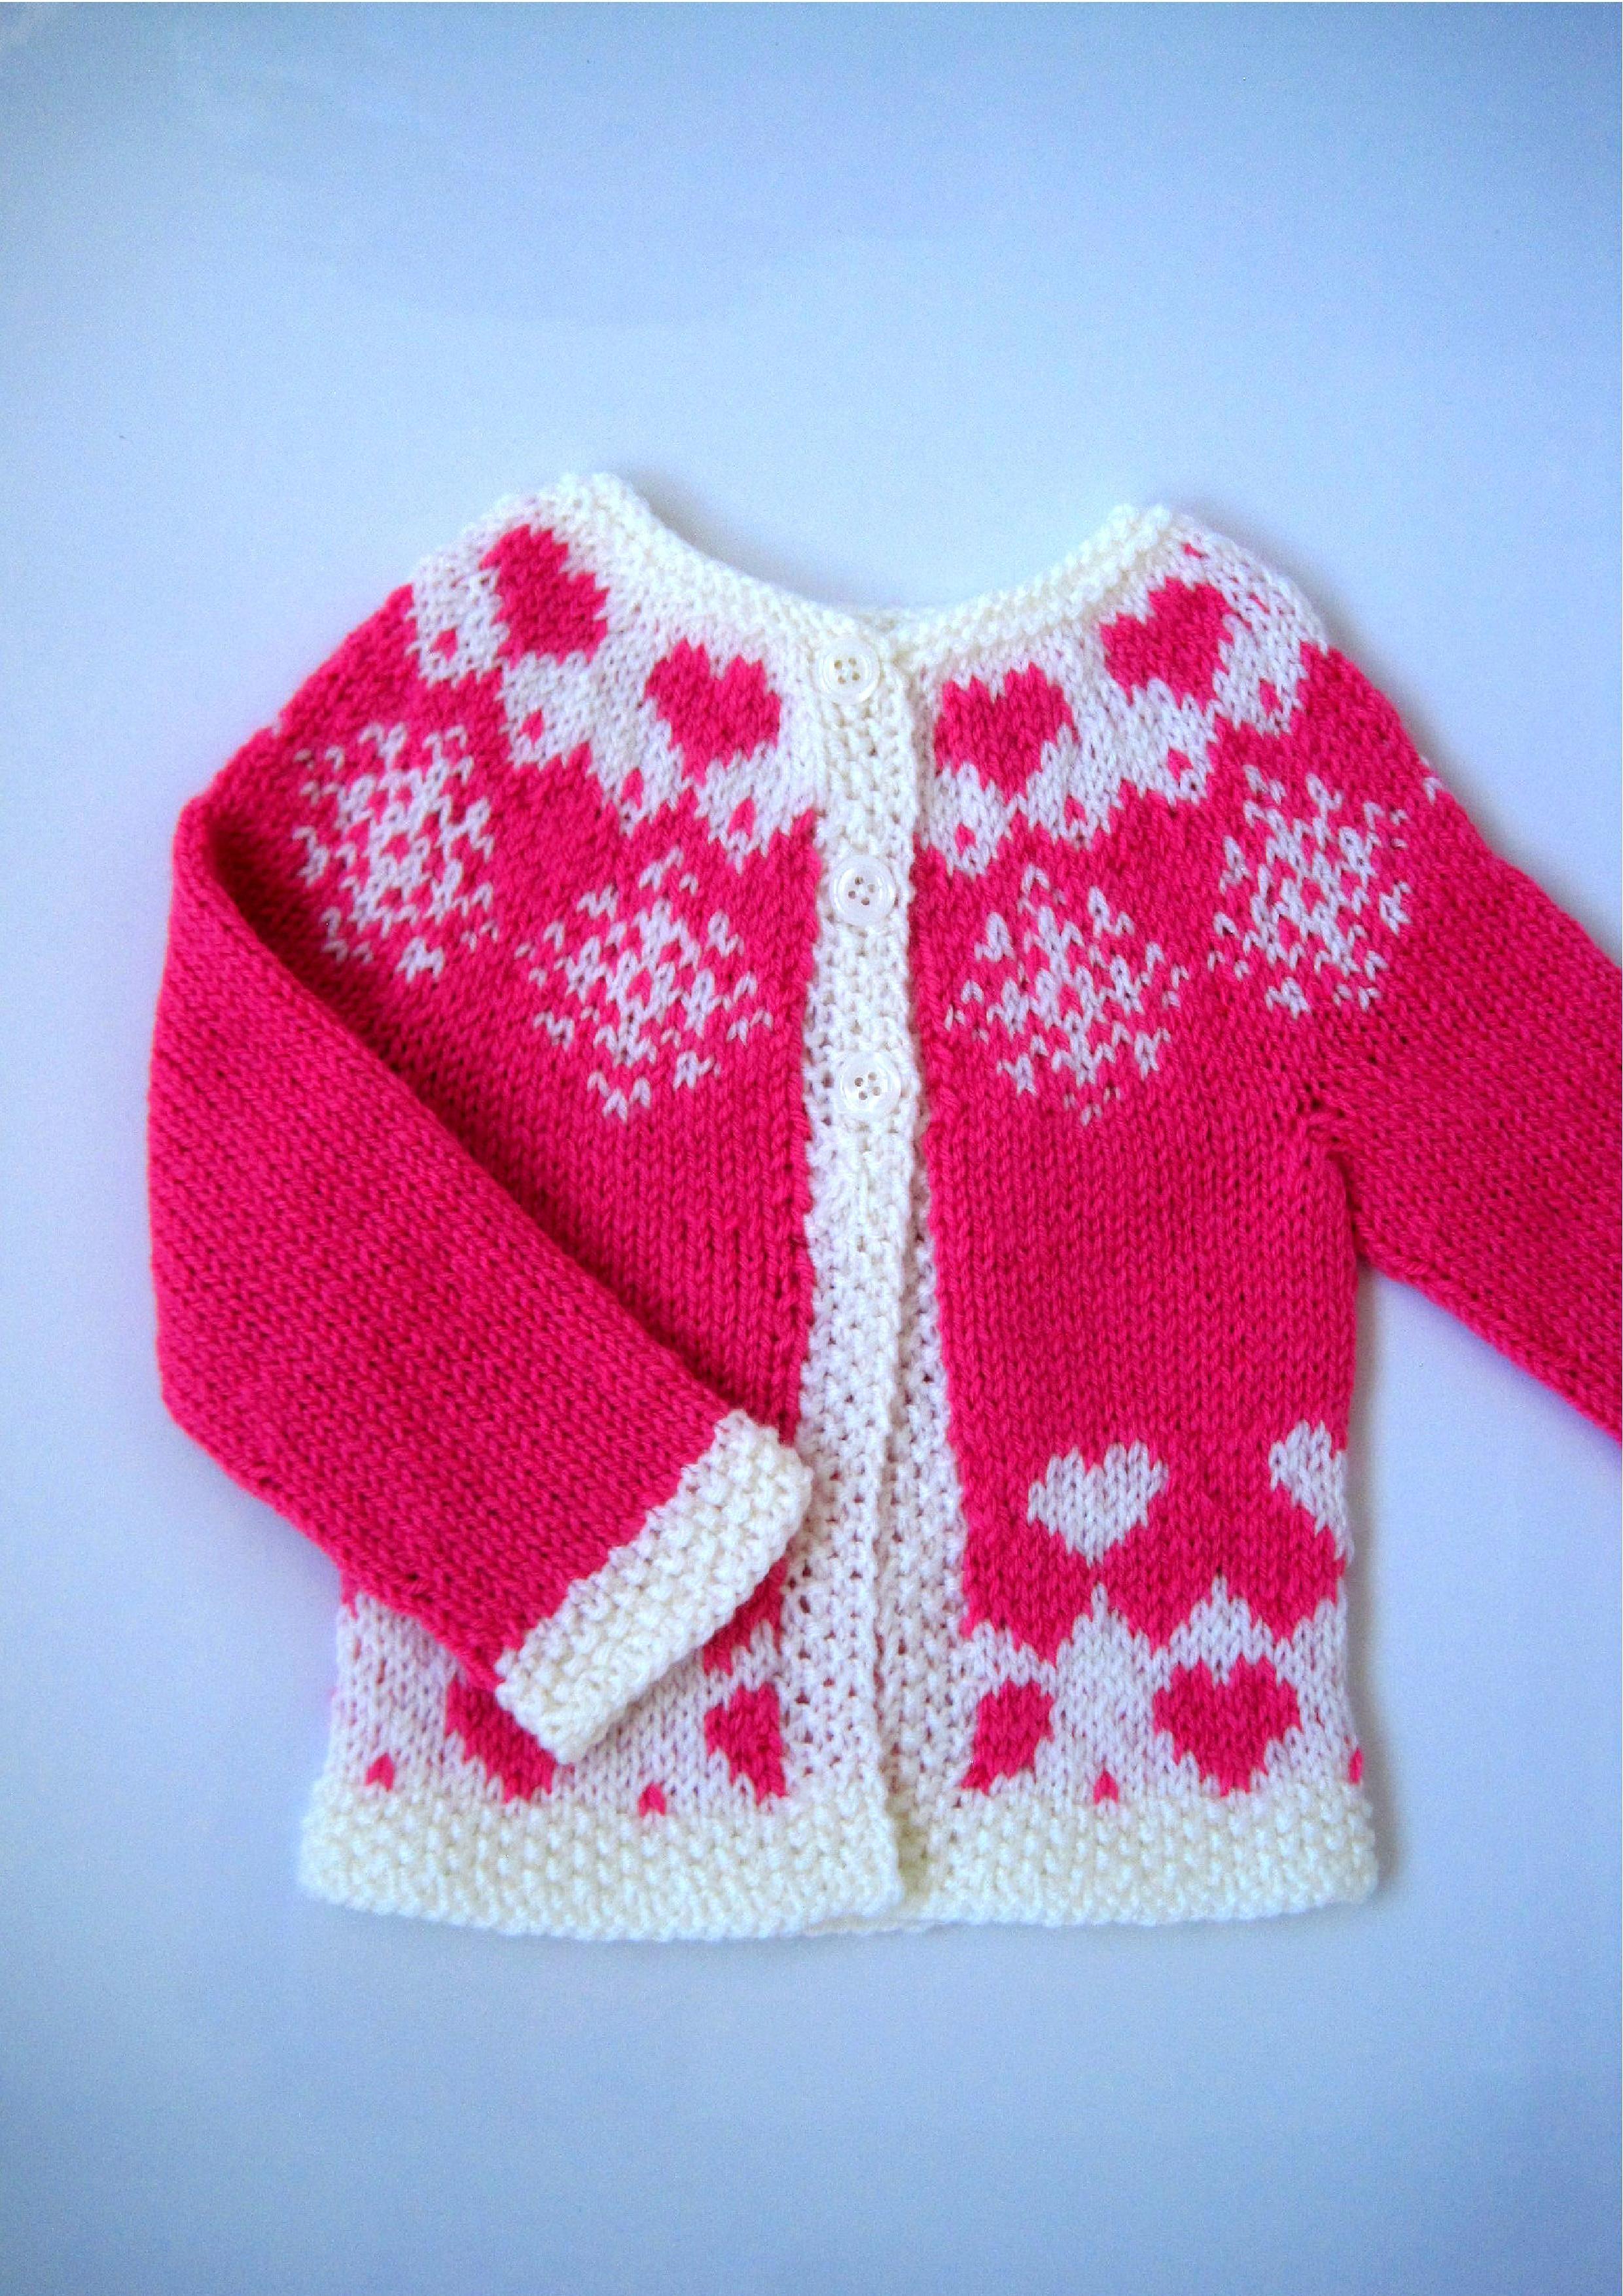 mollie cardigan cardi sweater knitting pattern by Suzie Sparkles ...